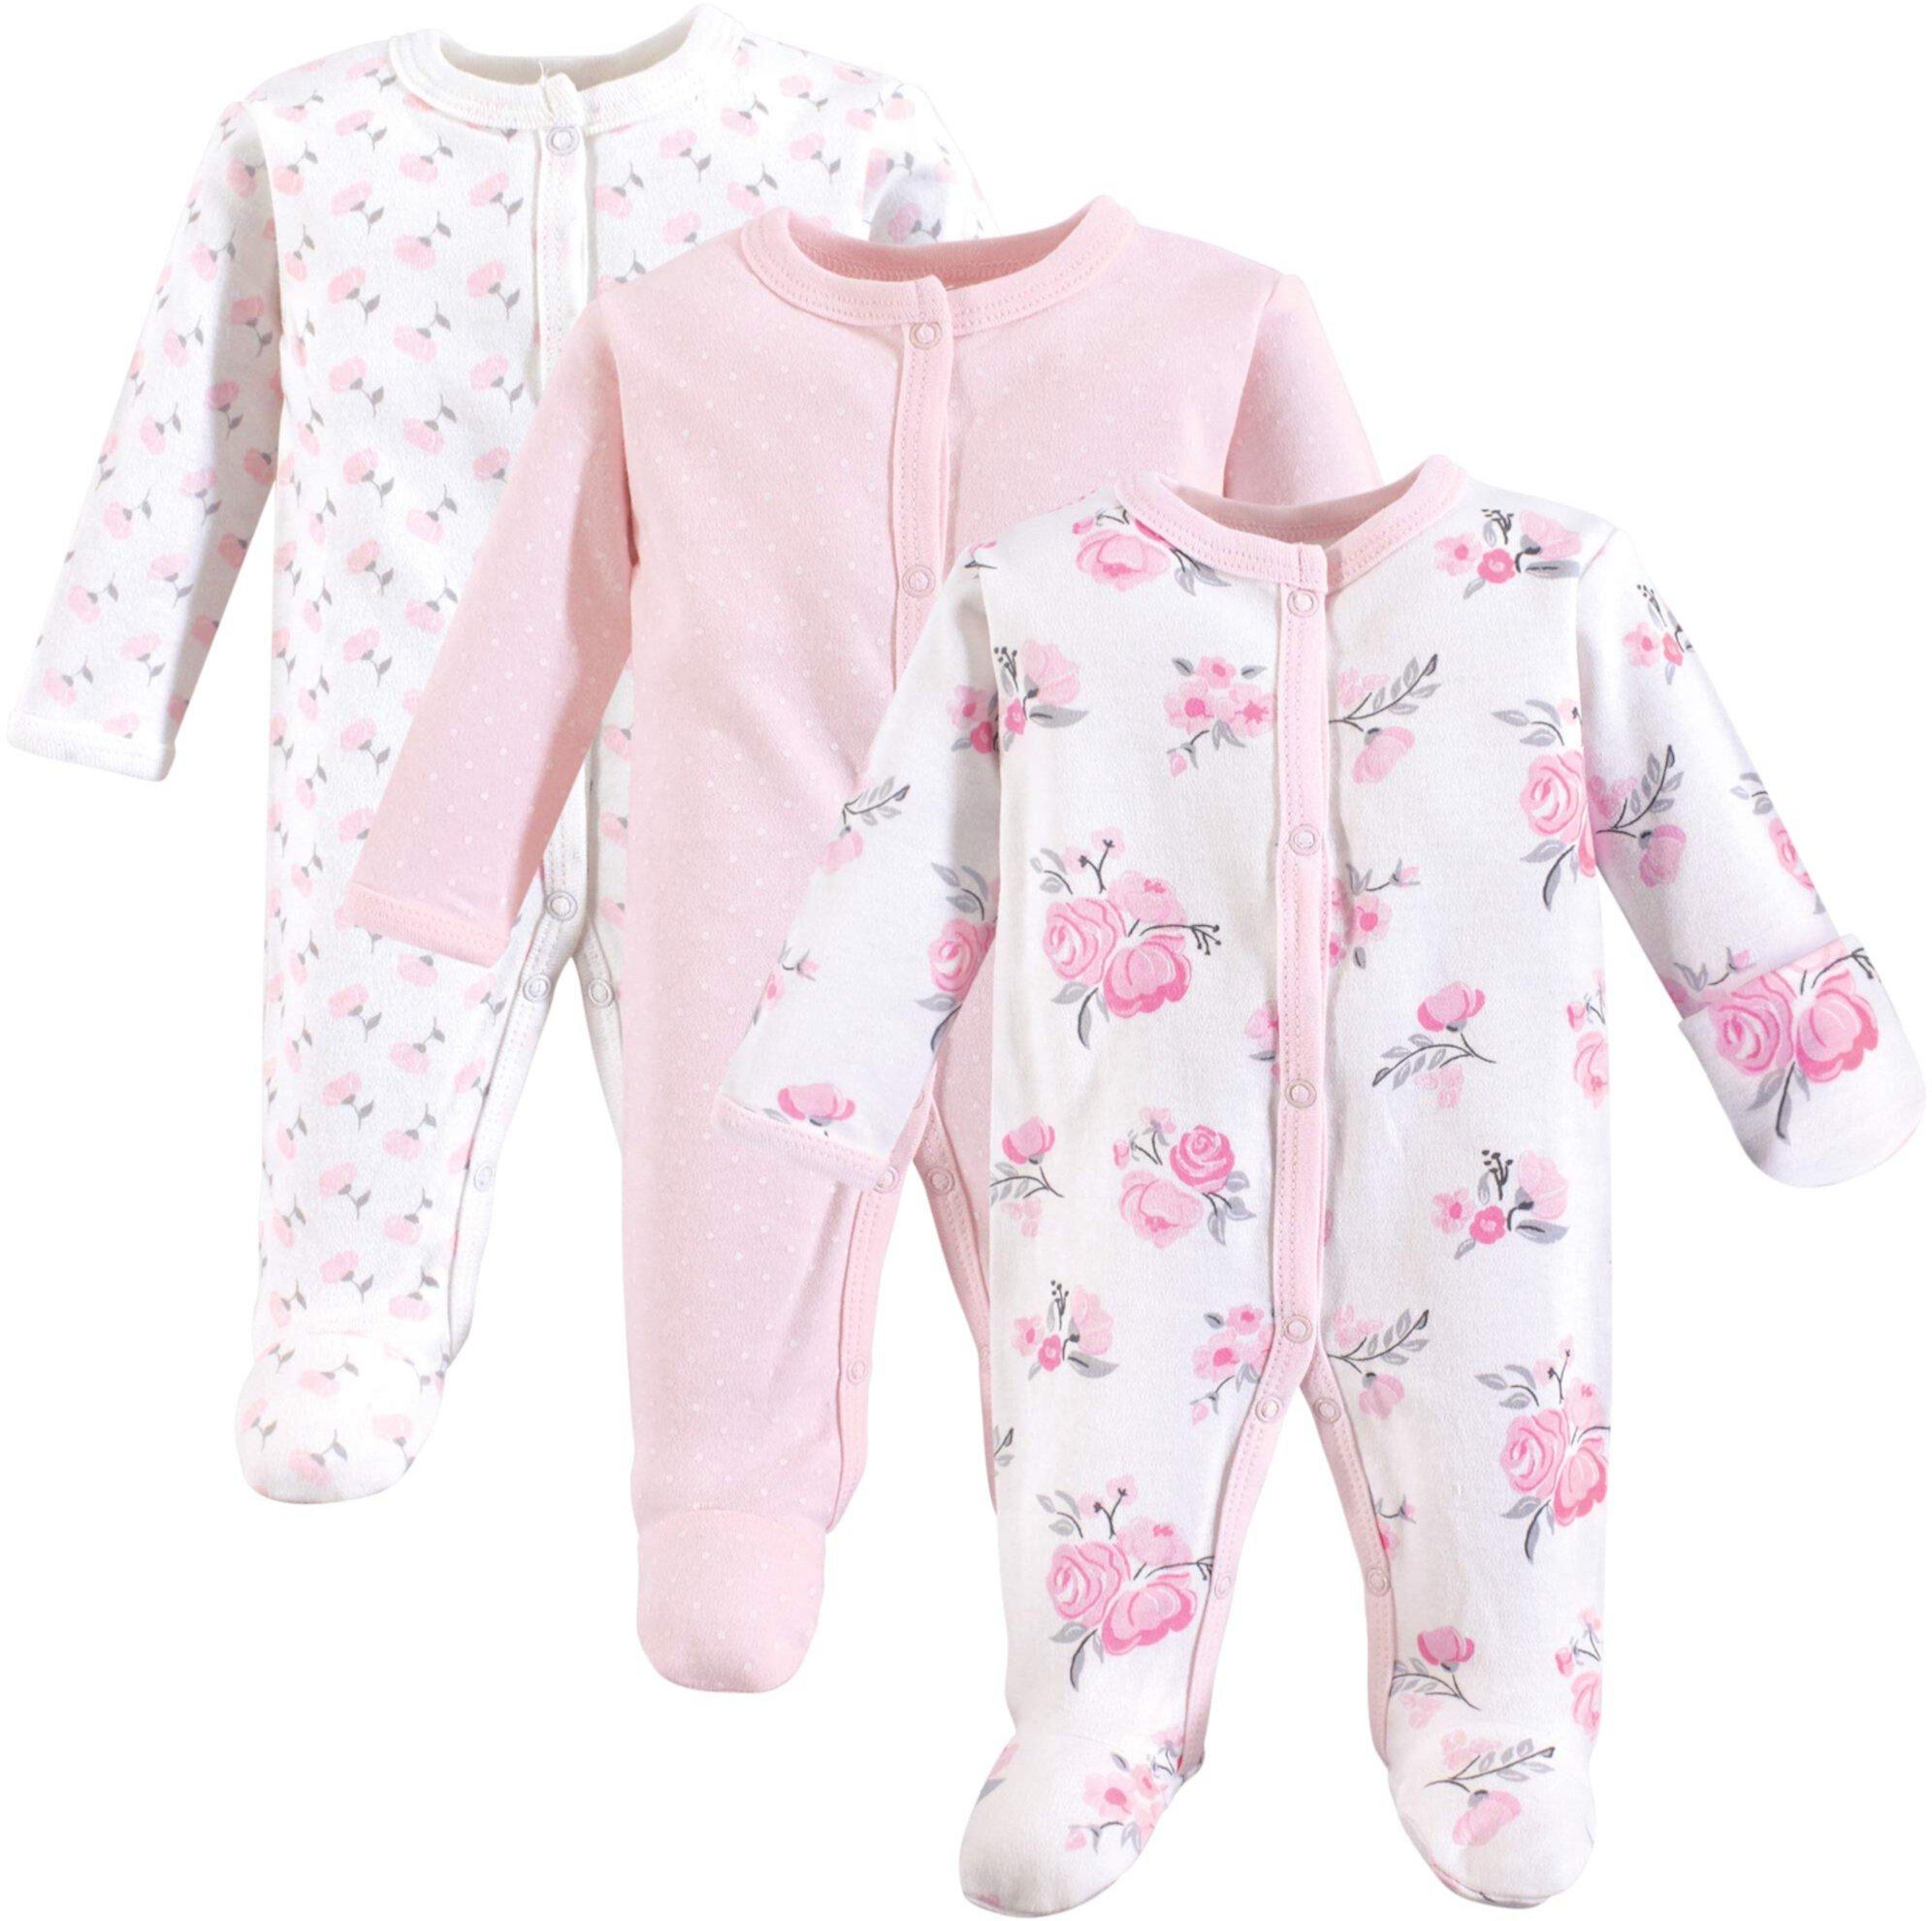 Cotton Preemie Sleep and Play (Infant) Hudson Baby